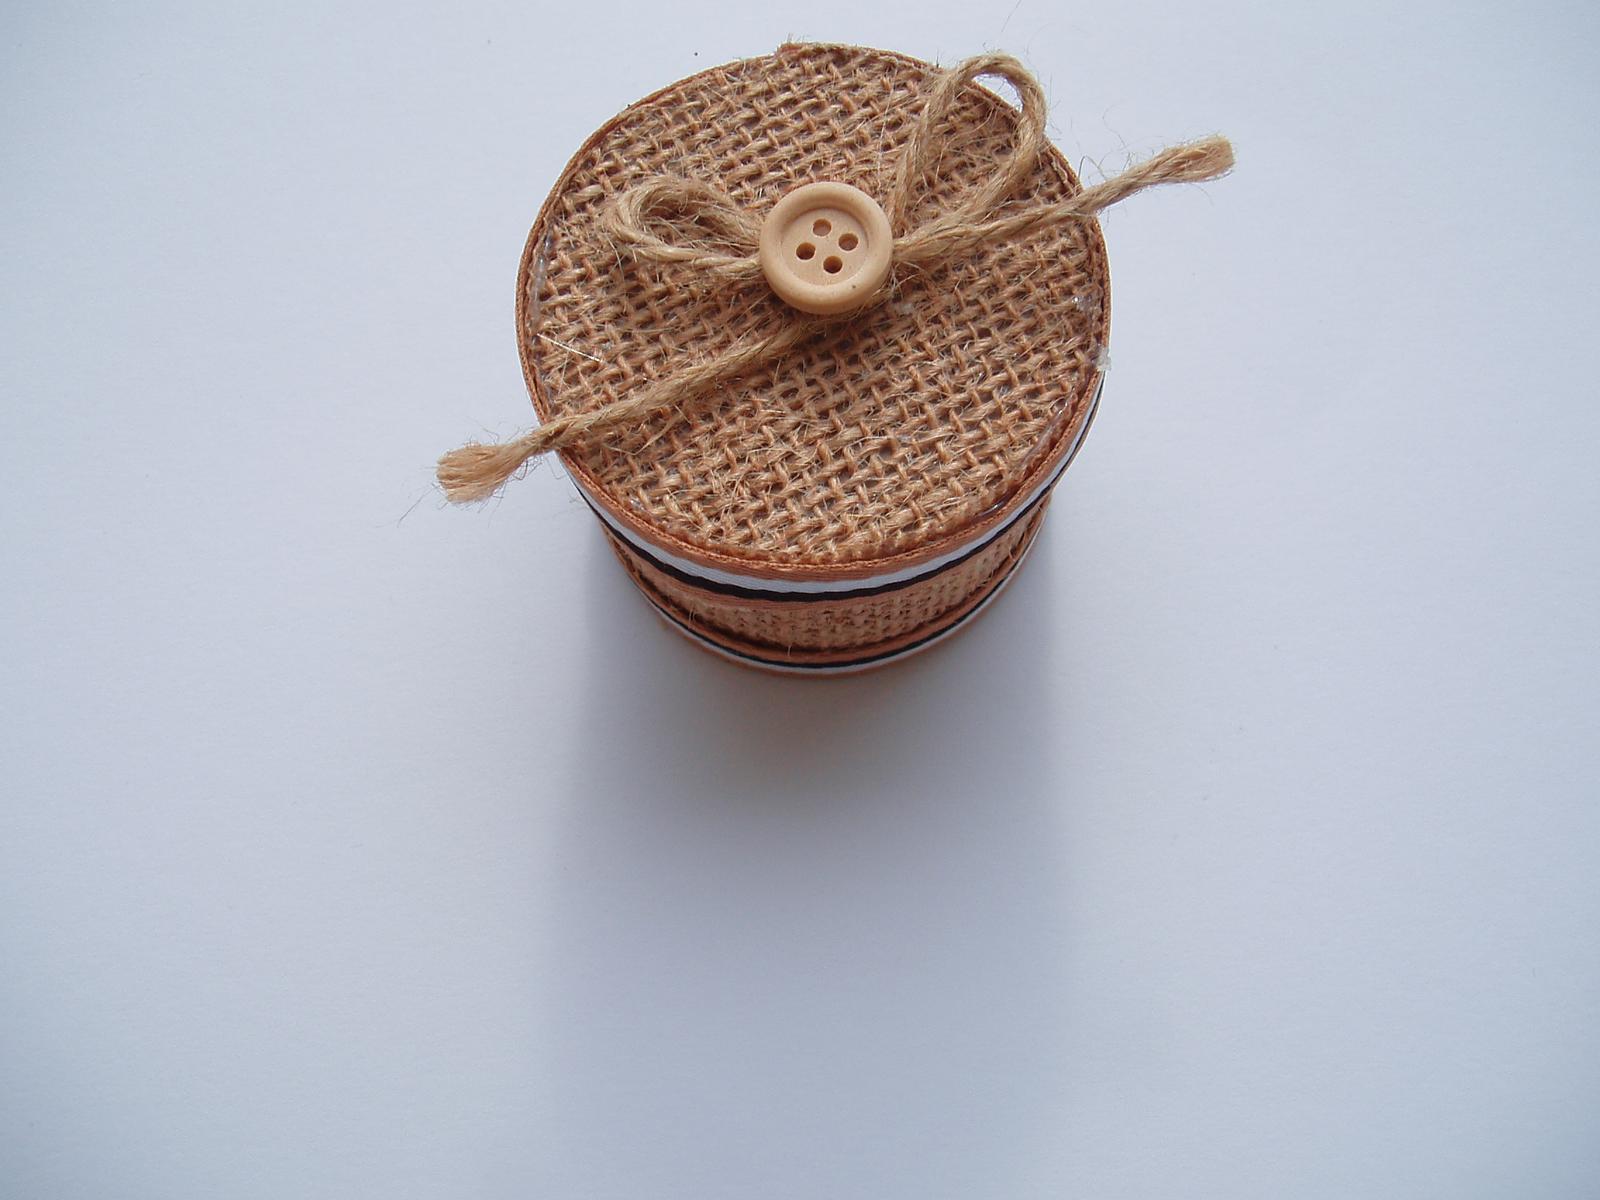 jutová krabička - Obrázek č. 1